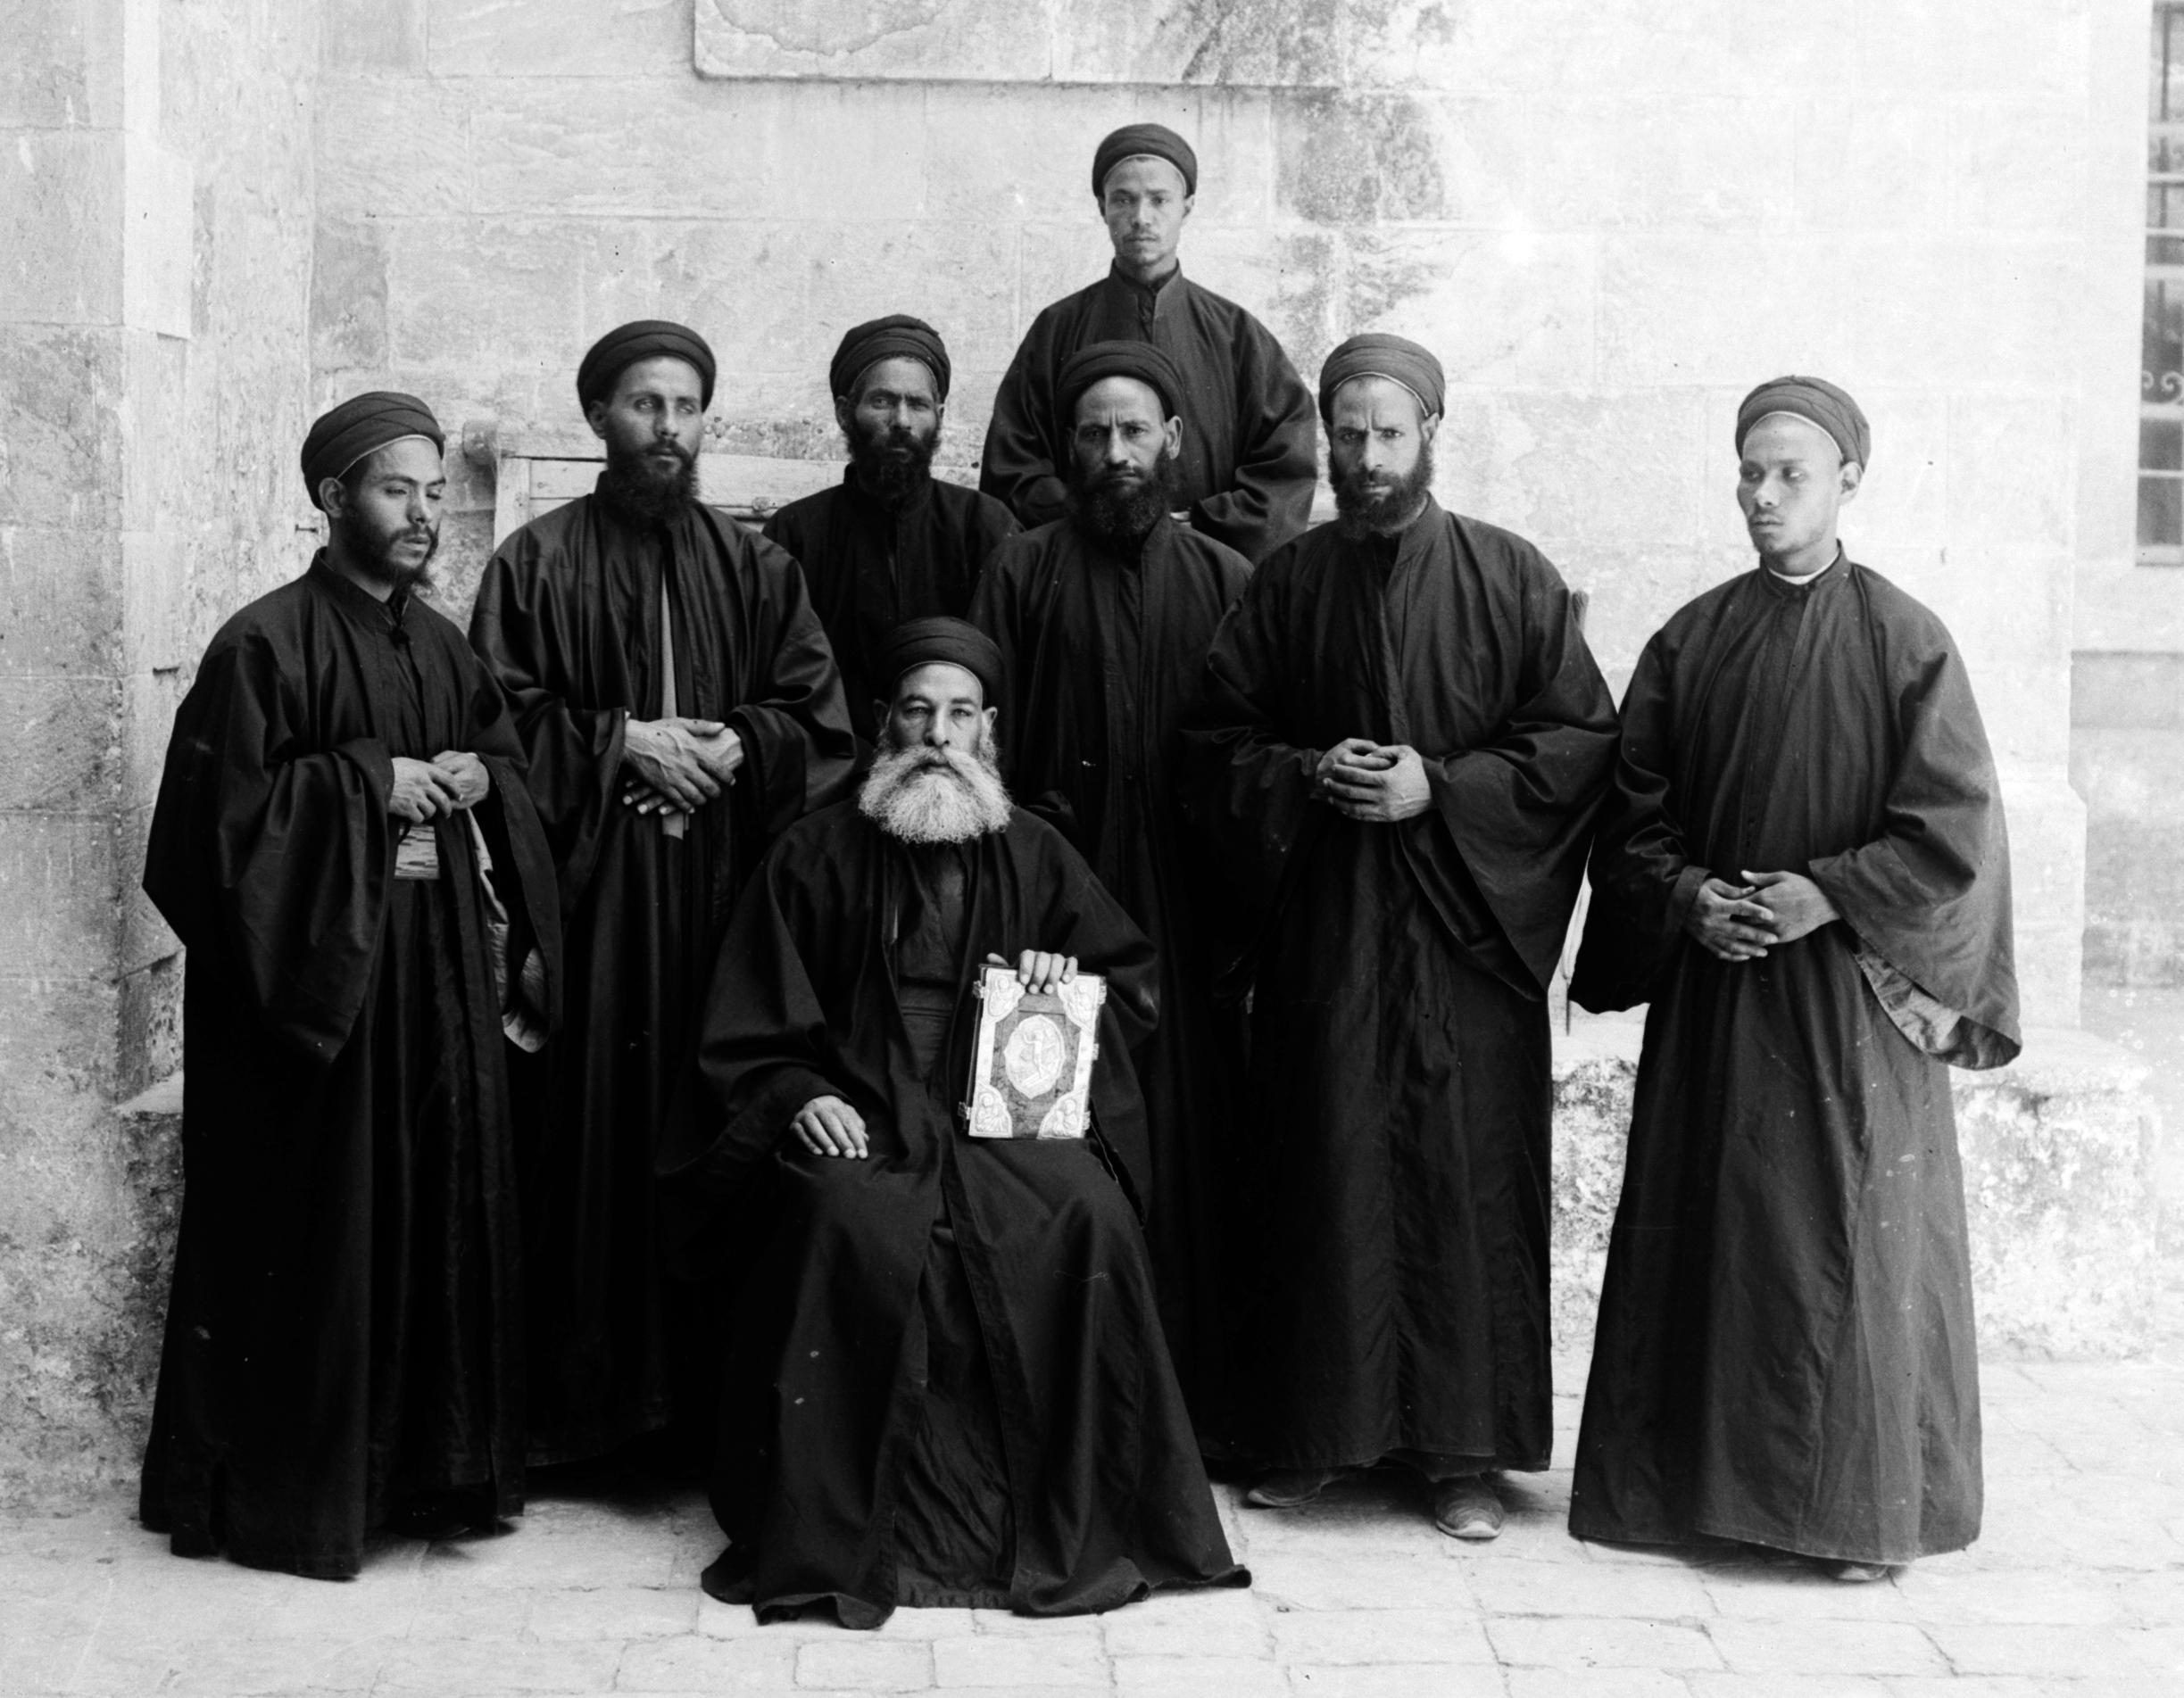 File:Coptic monks.jpg - Wikimedia Commons